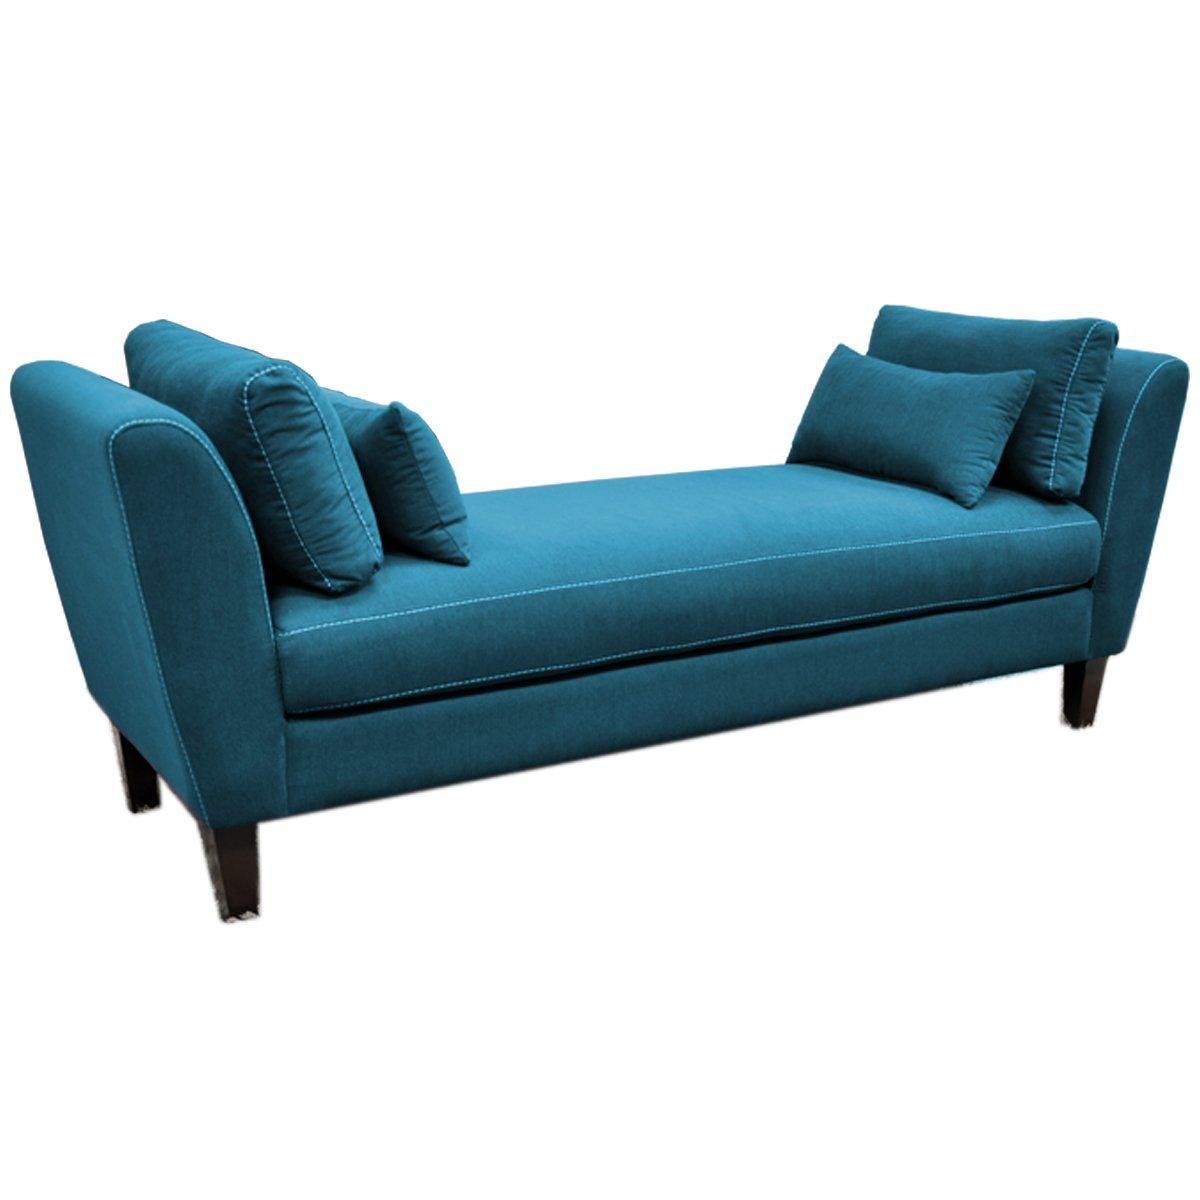 Pie de cama prius tela azul sears com mx me entiende - Pie de cama ...